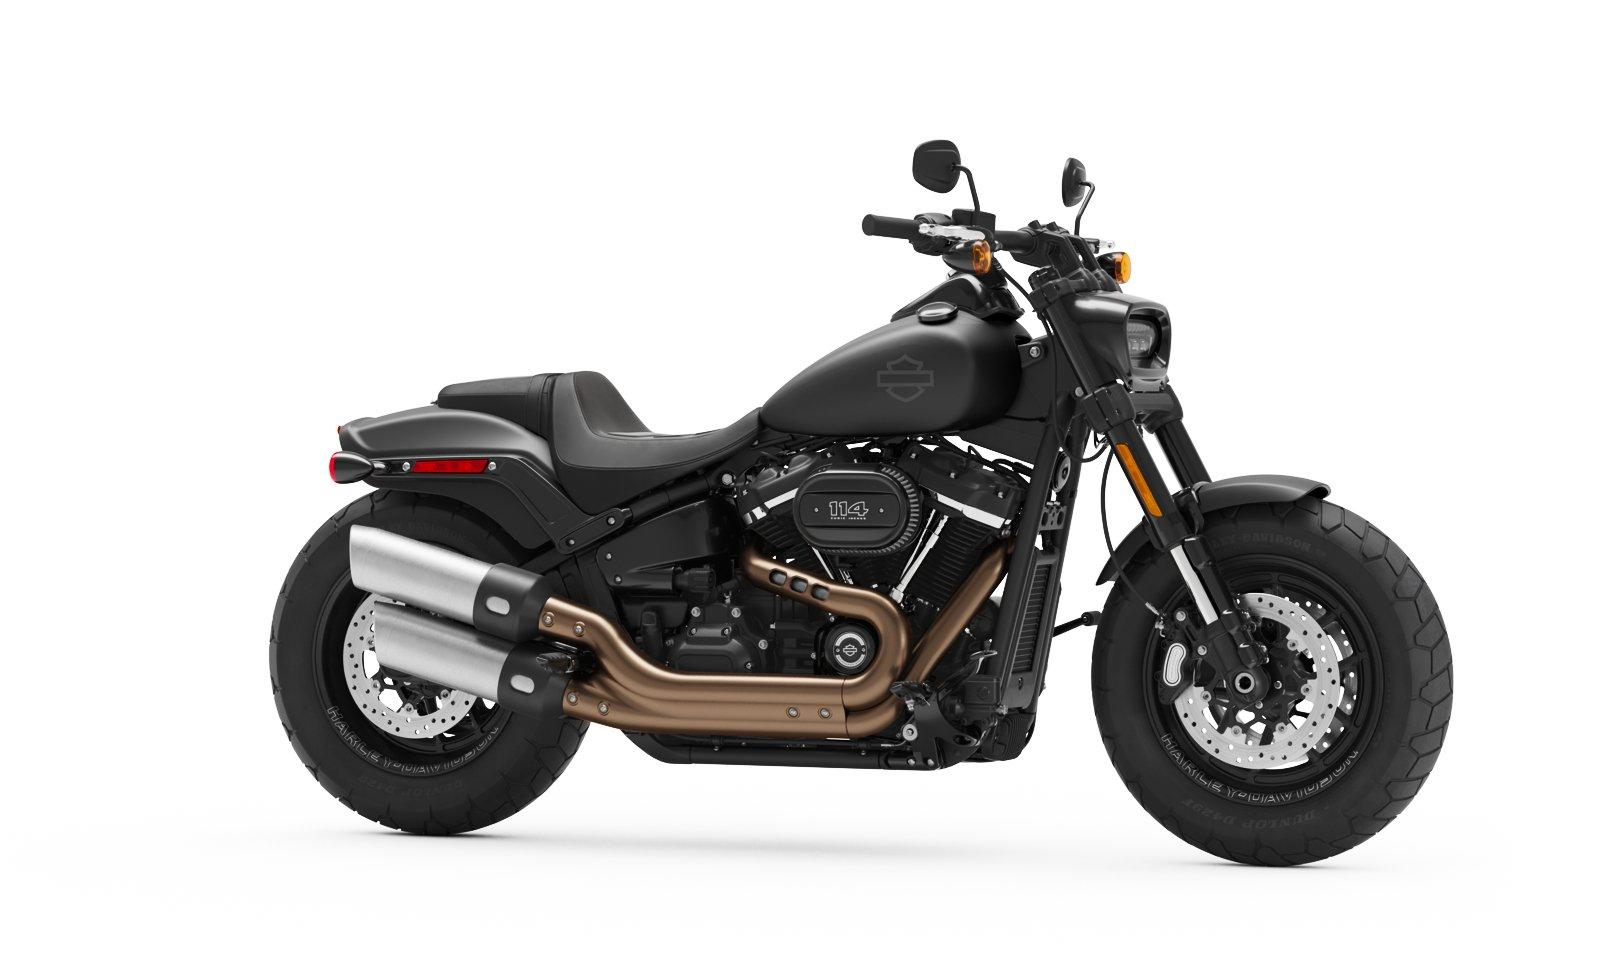 114 2020 fat bob motorcycle harley davidson united states 1142 latigo cv 91915 2020 fat bob motorcycle harley